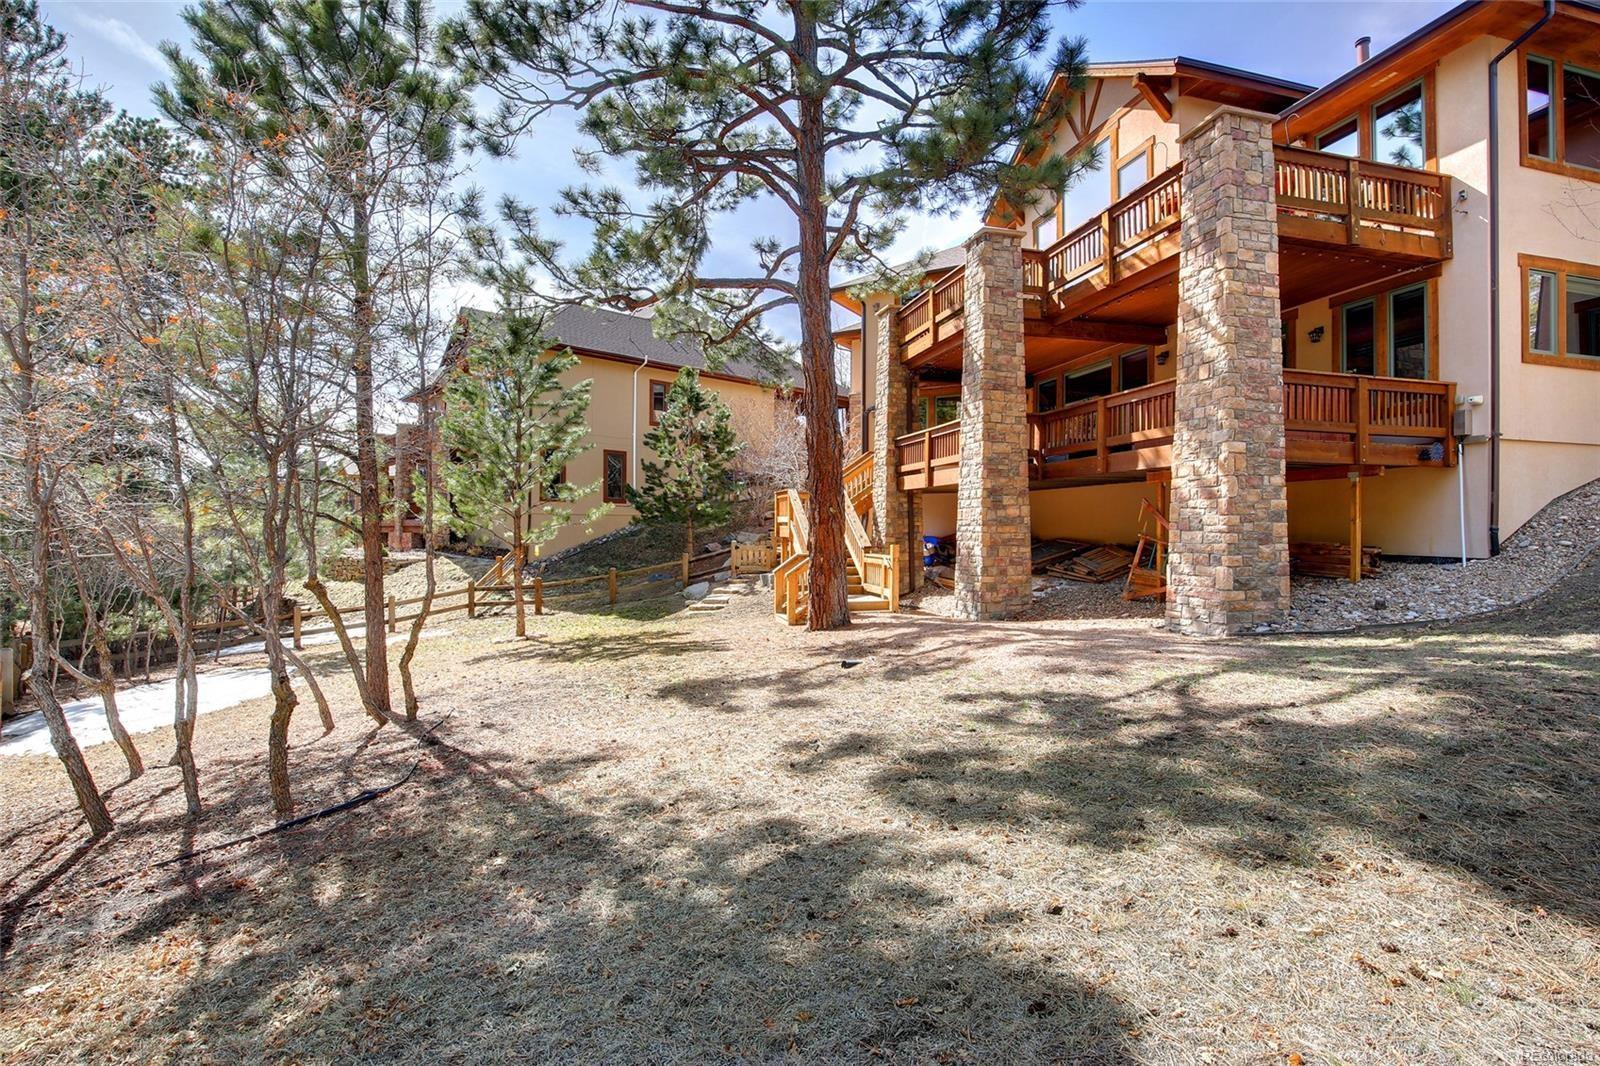 MLS# 4879945 - 32 - 2392 Saddleback Drive, Castle Rock, CO 80104